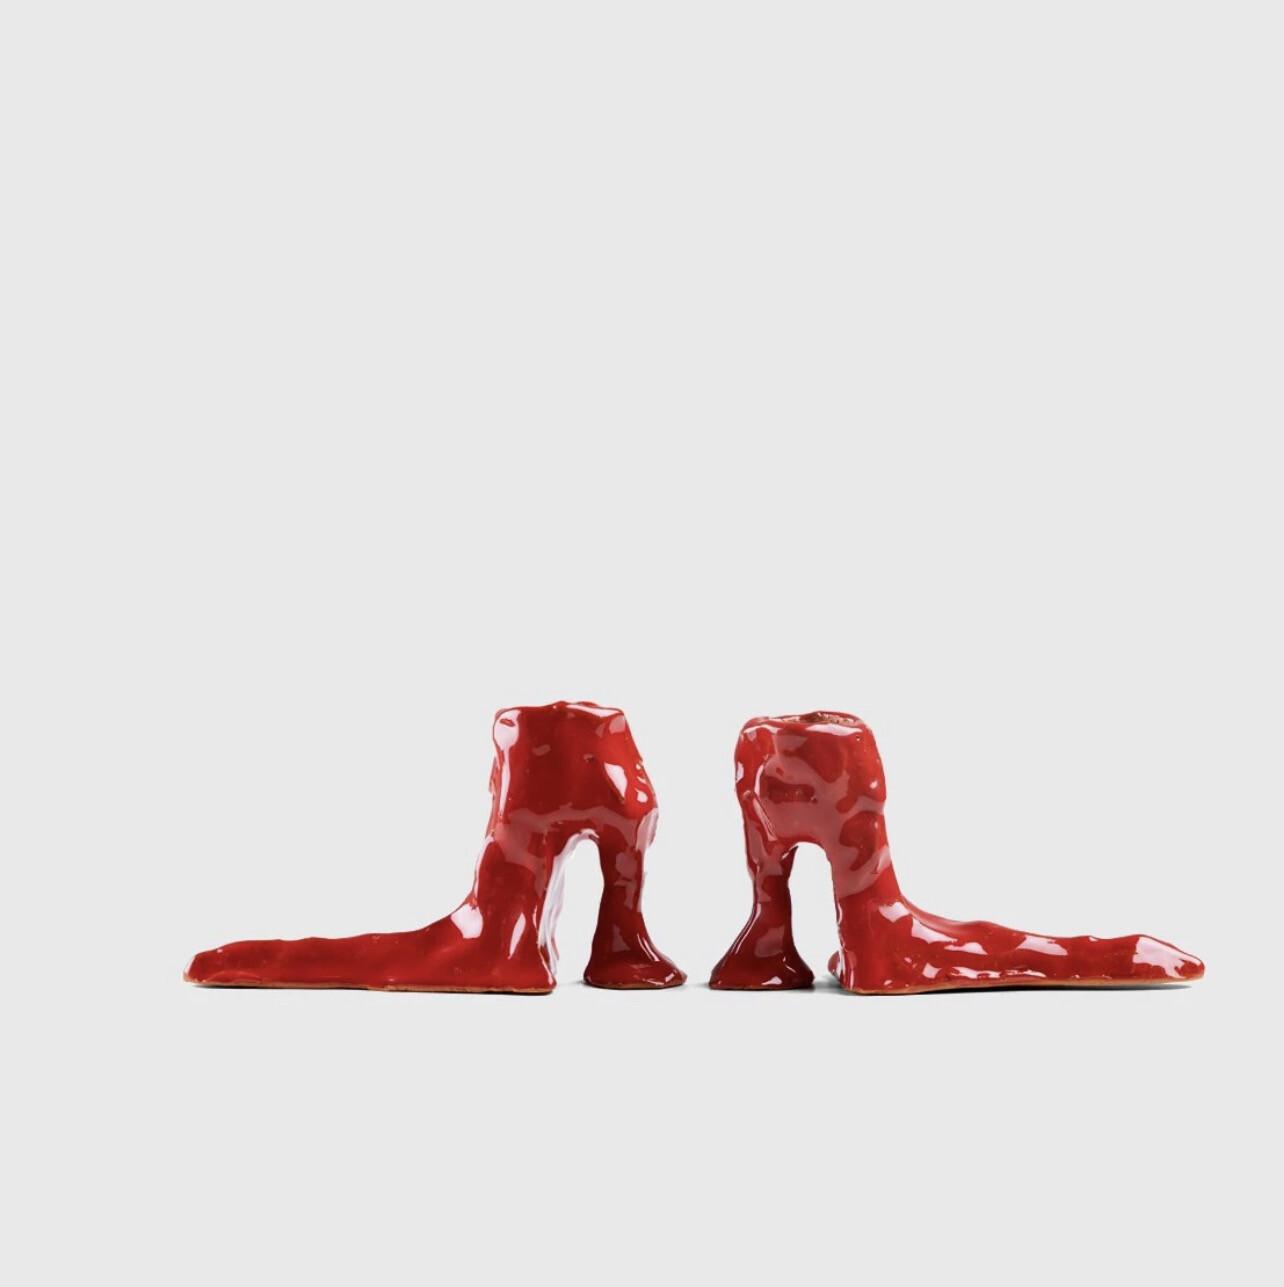 Laura Welker - Candle Holder Red 1x Left